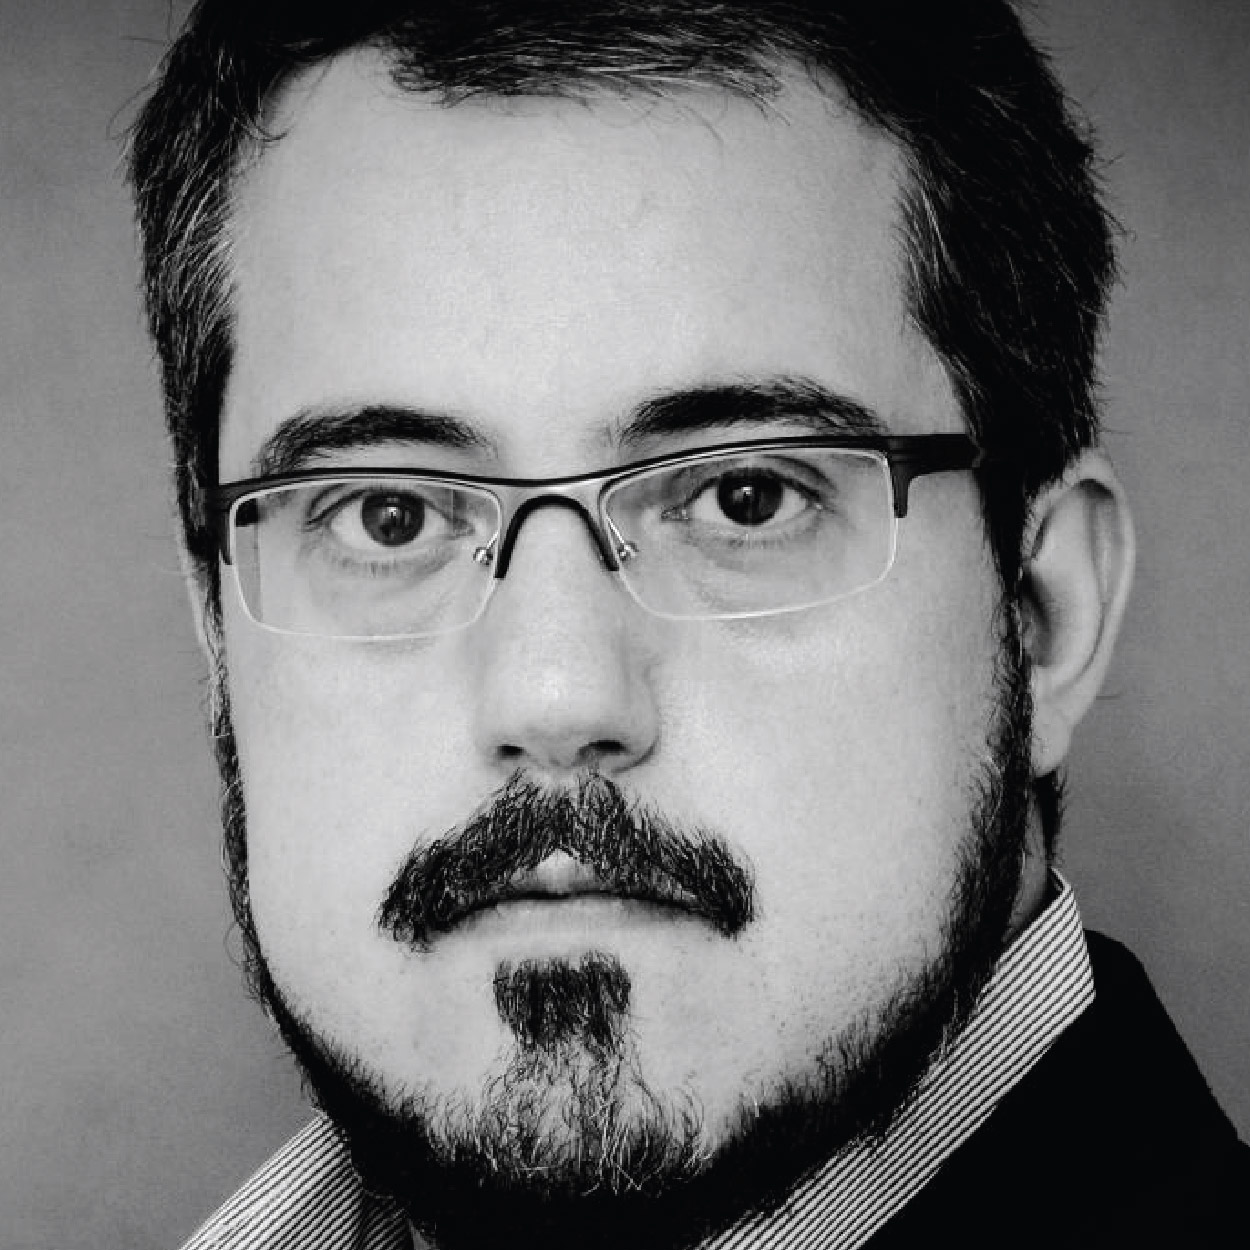 Igor Vieira stars as the wily Dr. Malatesta